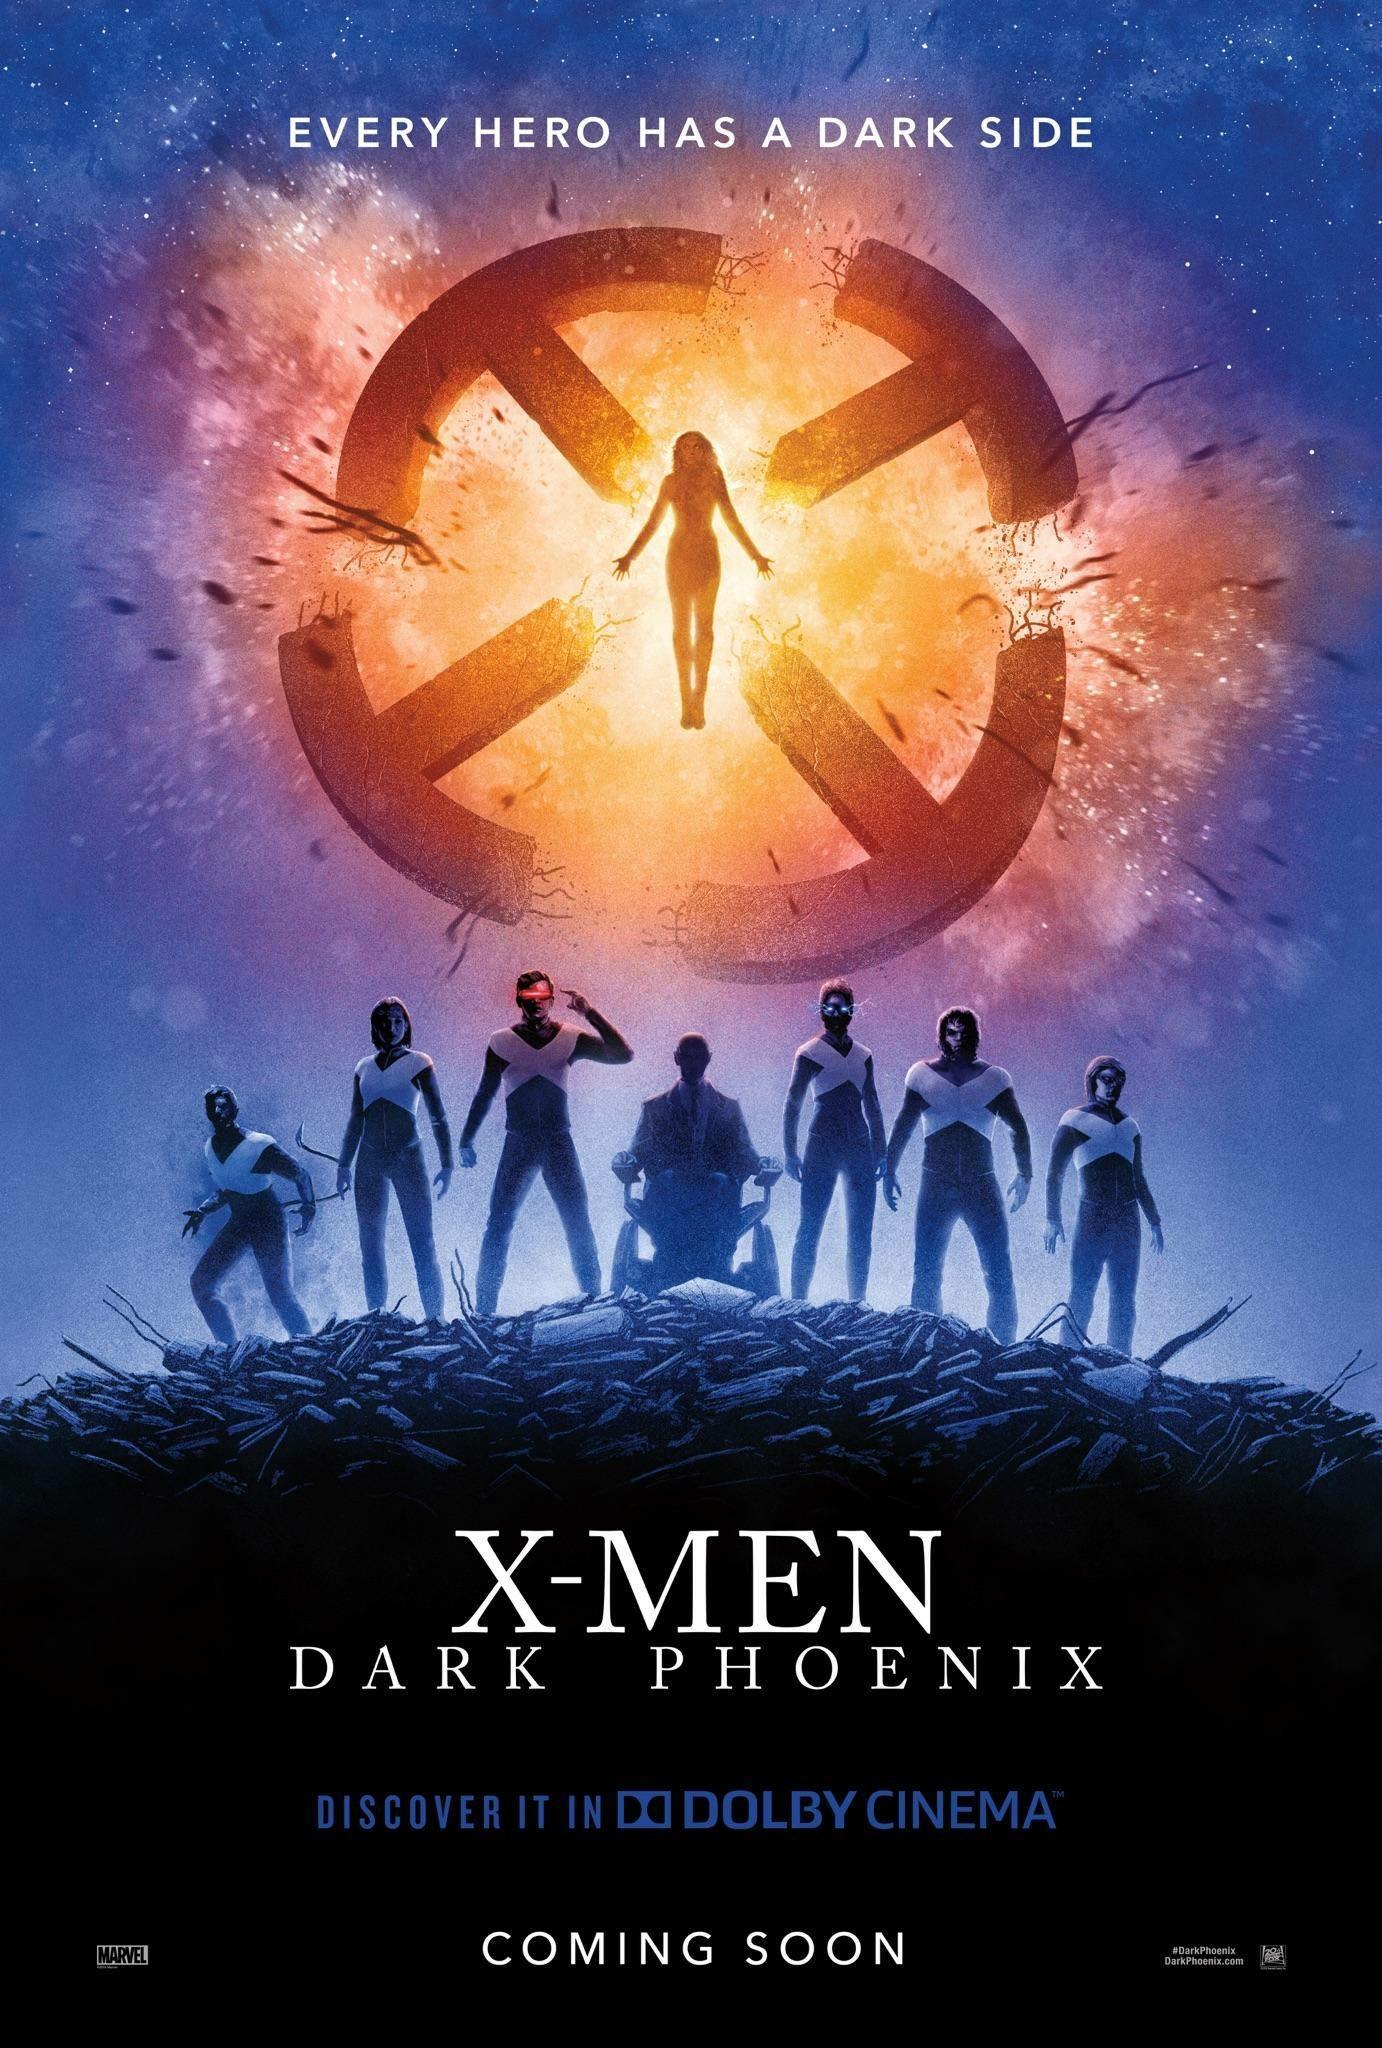 szmk_x_men_sotet_fonix_dark_phoneix_marvel_magneto_professor_mistique_mutant_beast_quicksilver_14.jpg